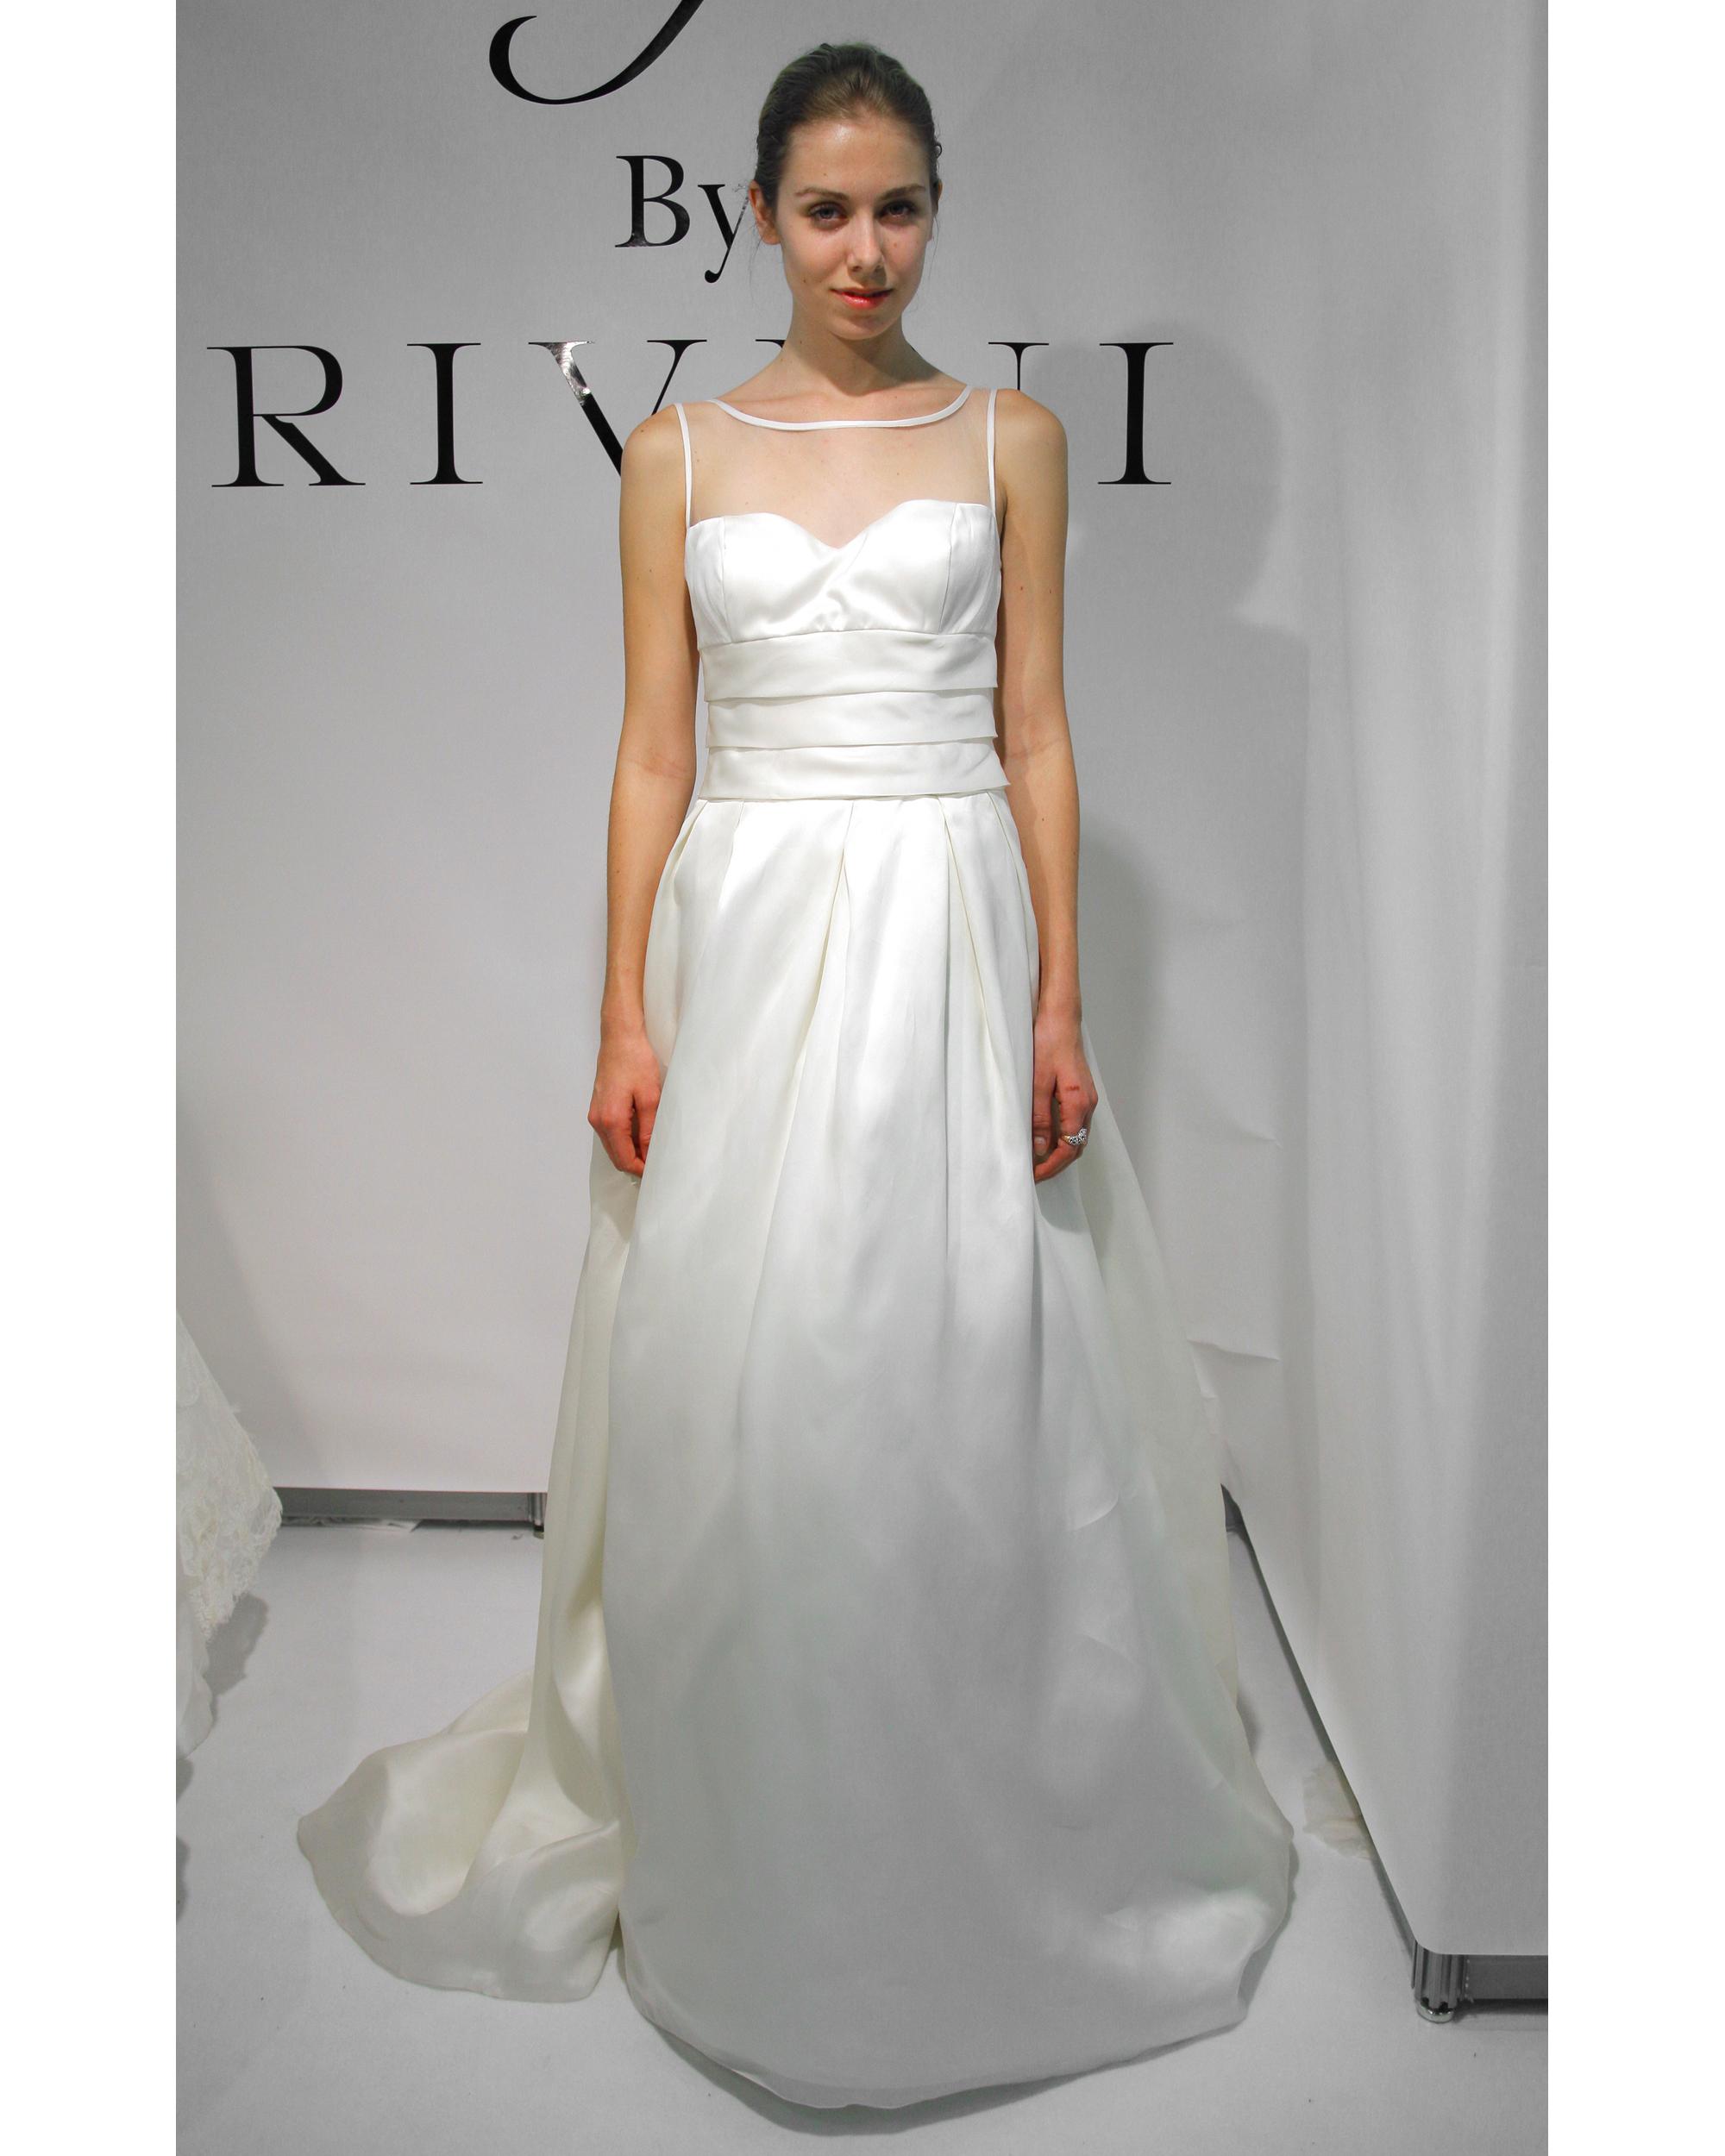 alyne-by-rivini-fall2012-wd108109-002.jpg